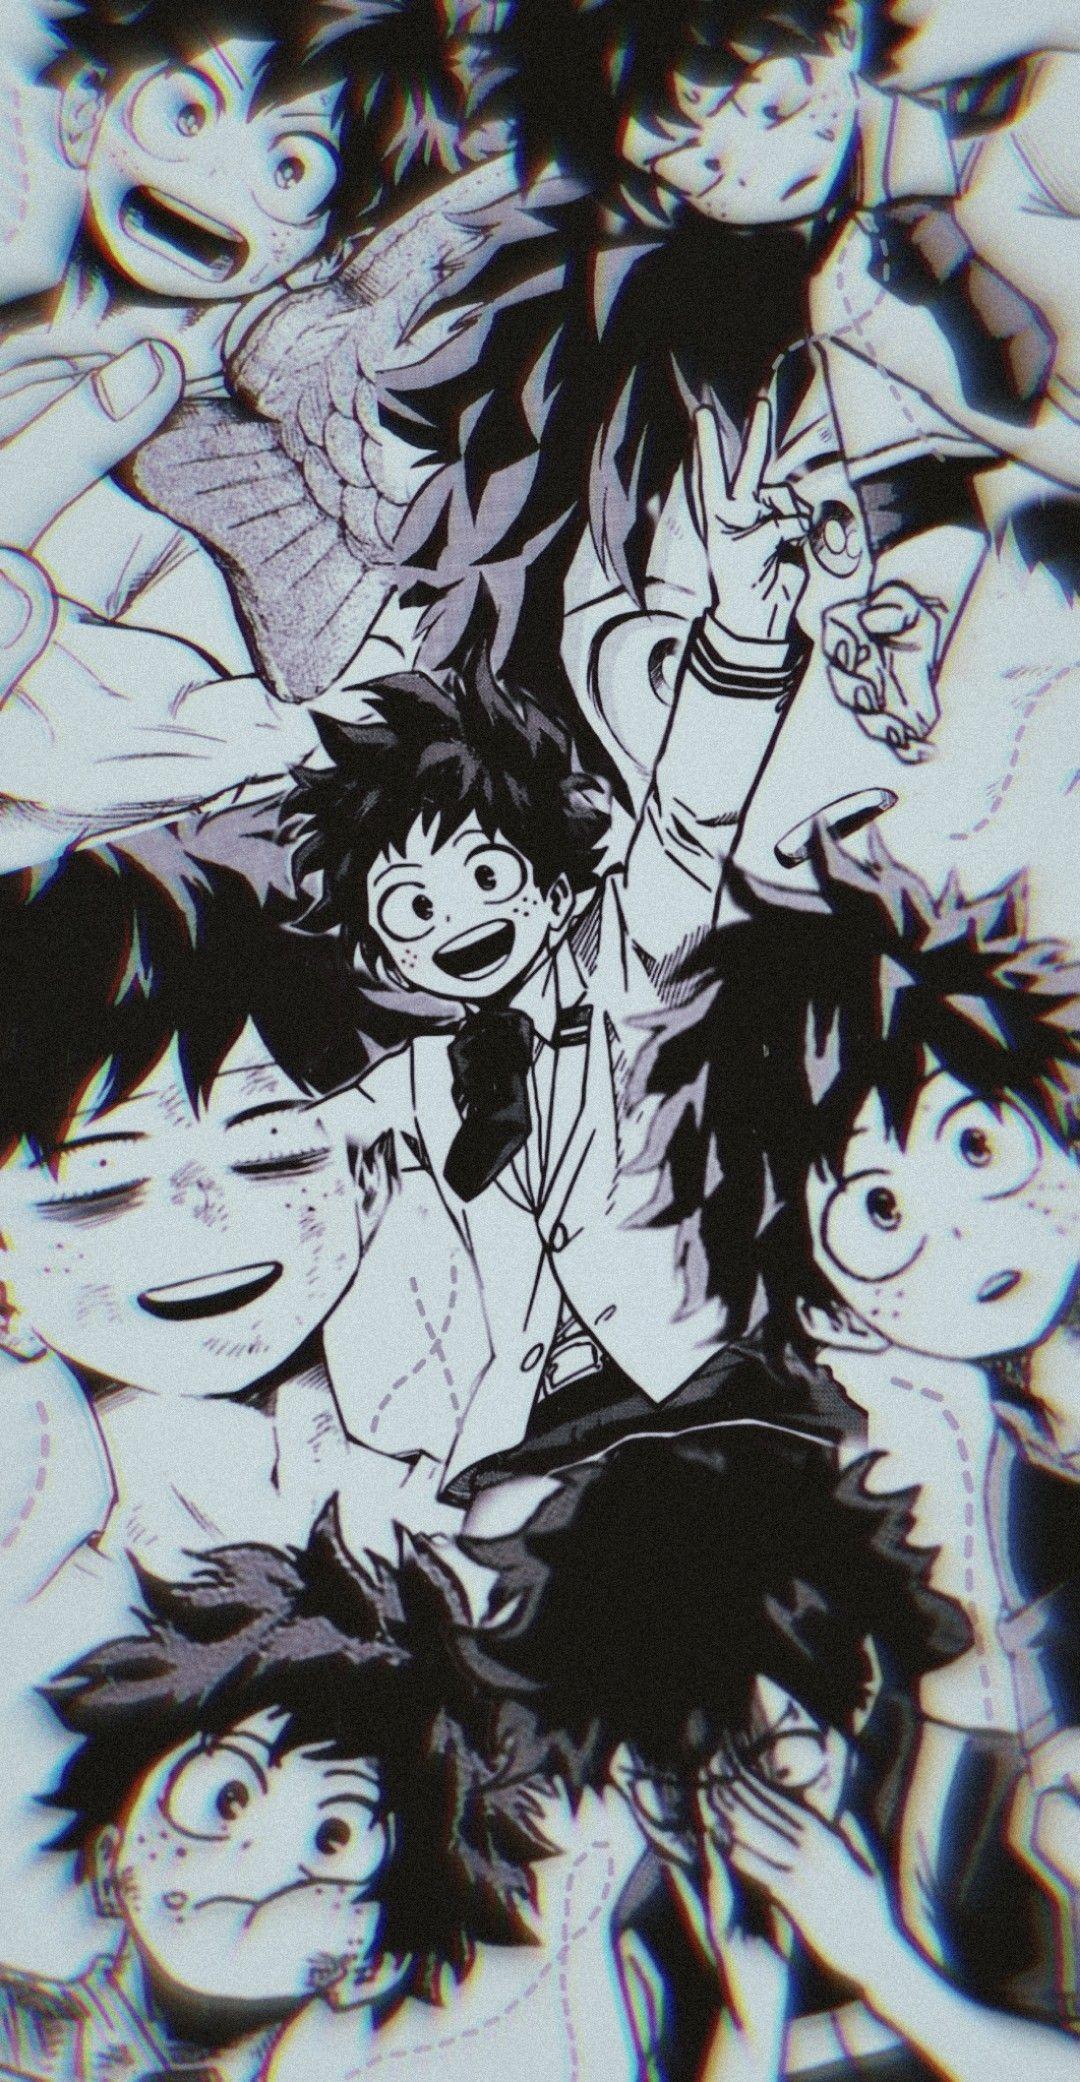 Pin By Shirel2309 On Bnha Anime Wallpaper Hero Wallpaper Cute Anime Wallpaper